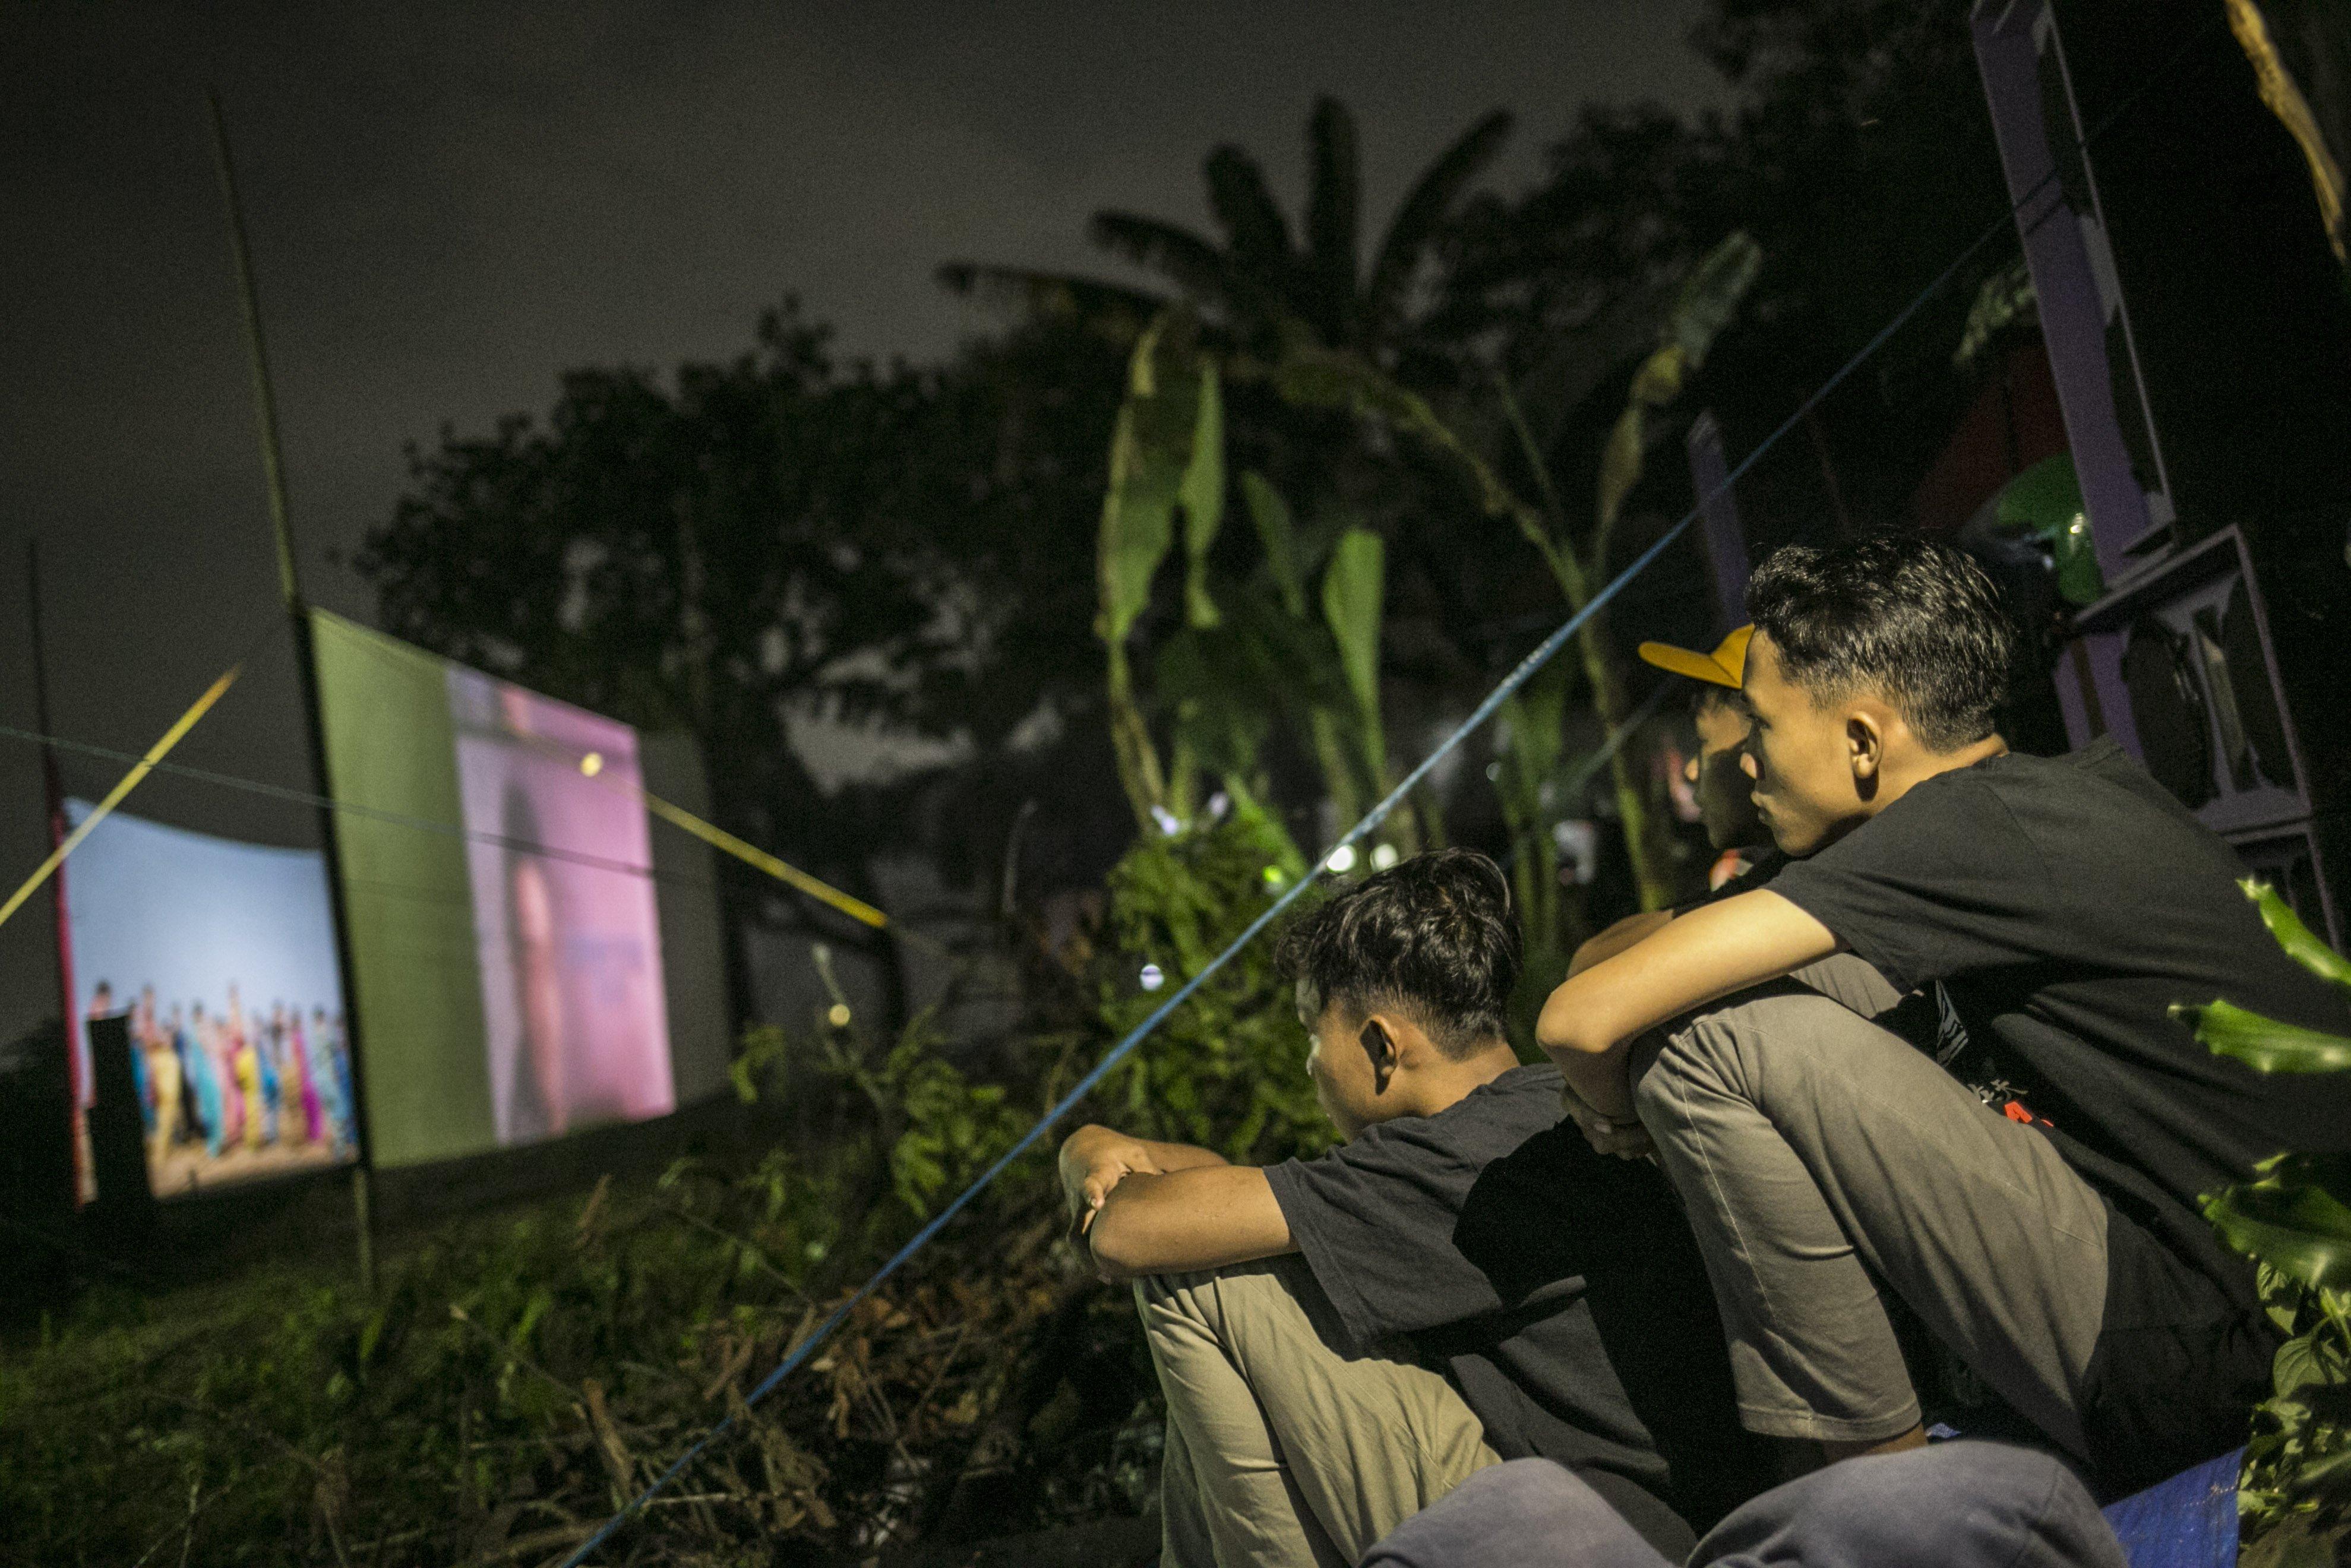 Warga menonron film layar tancap di Kawasan Sawangan, Depok, Jawa Barat, Sabtu (11/7/2020).